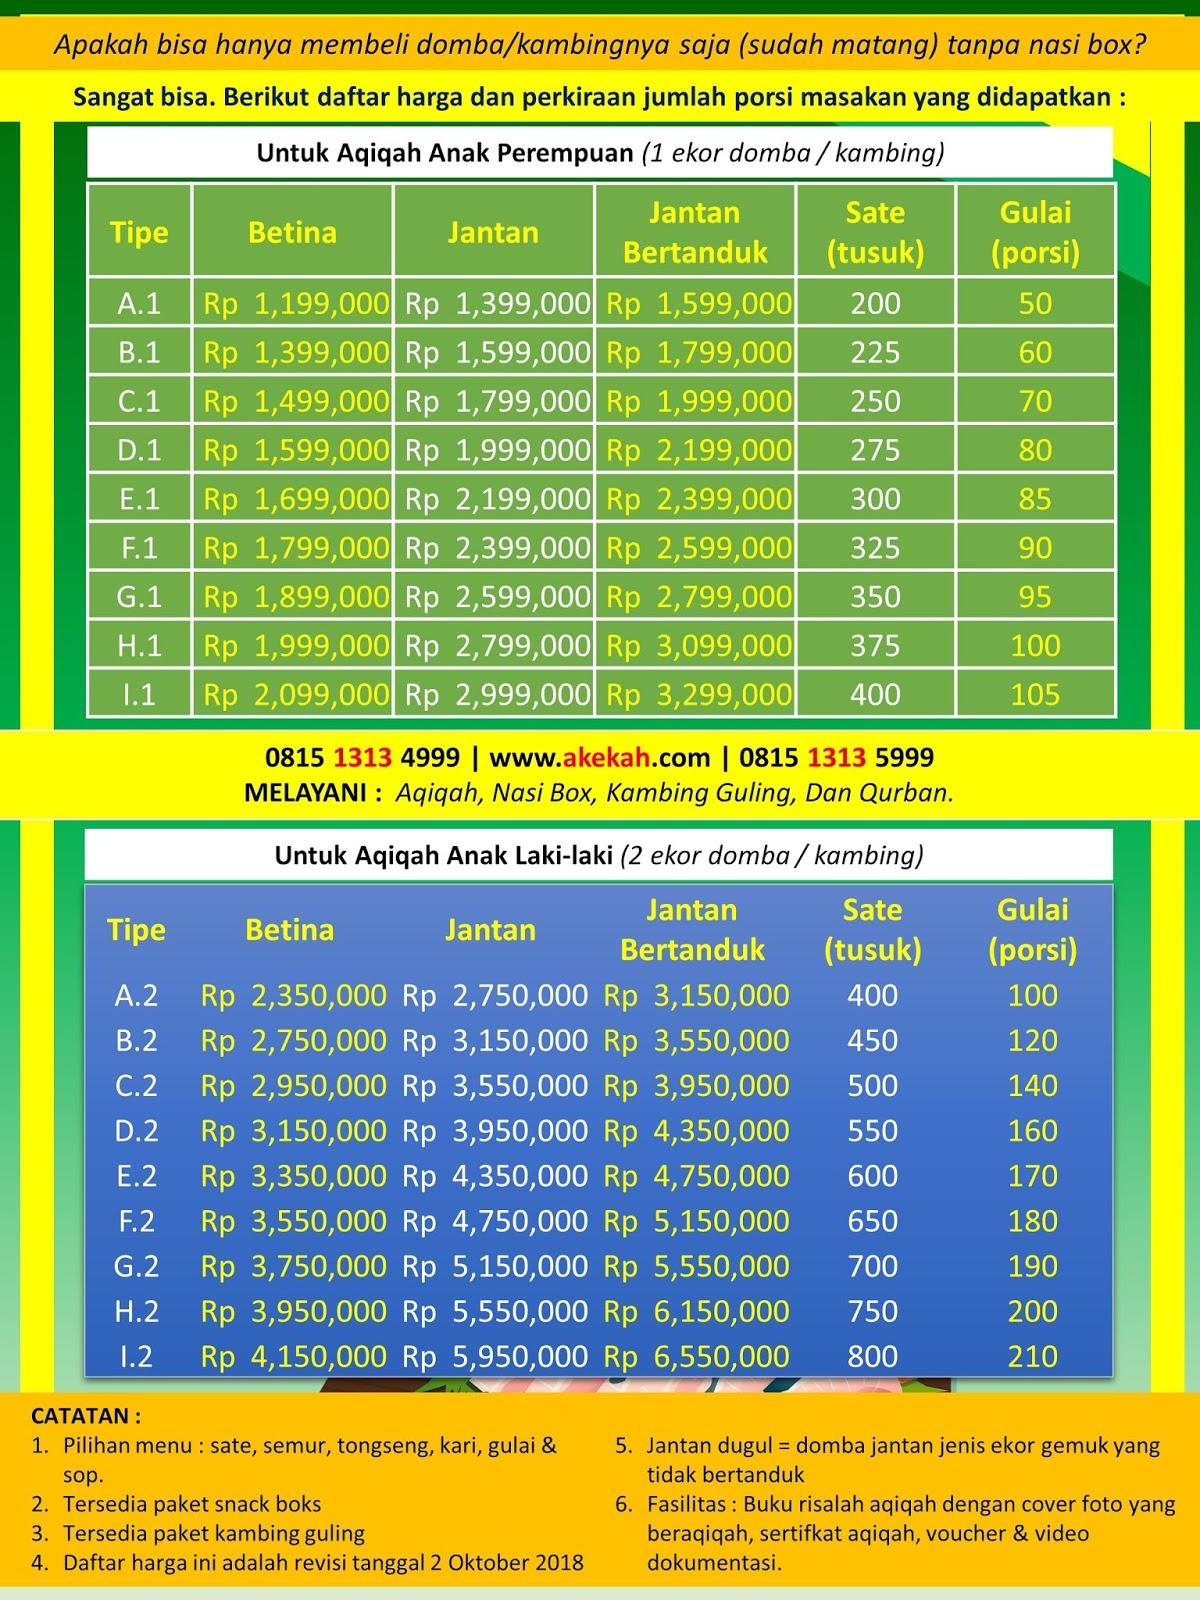 Harga Paket Aqiqah & Catering Bogor Tengah Kota Bogor Jawa Barat